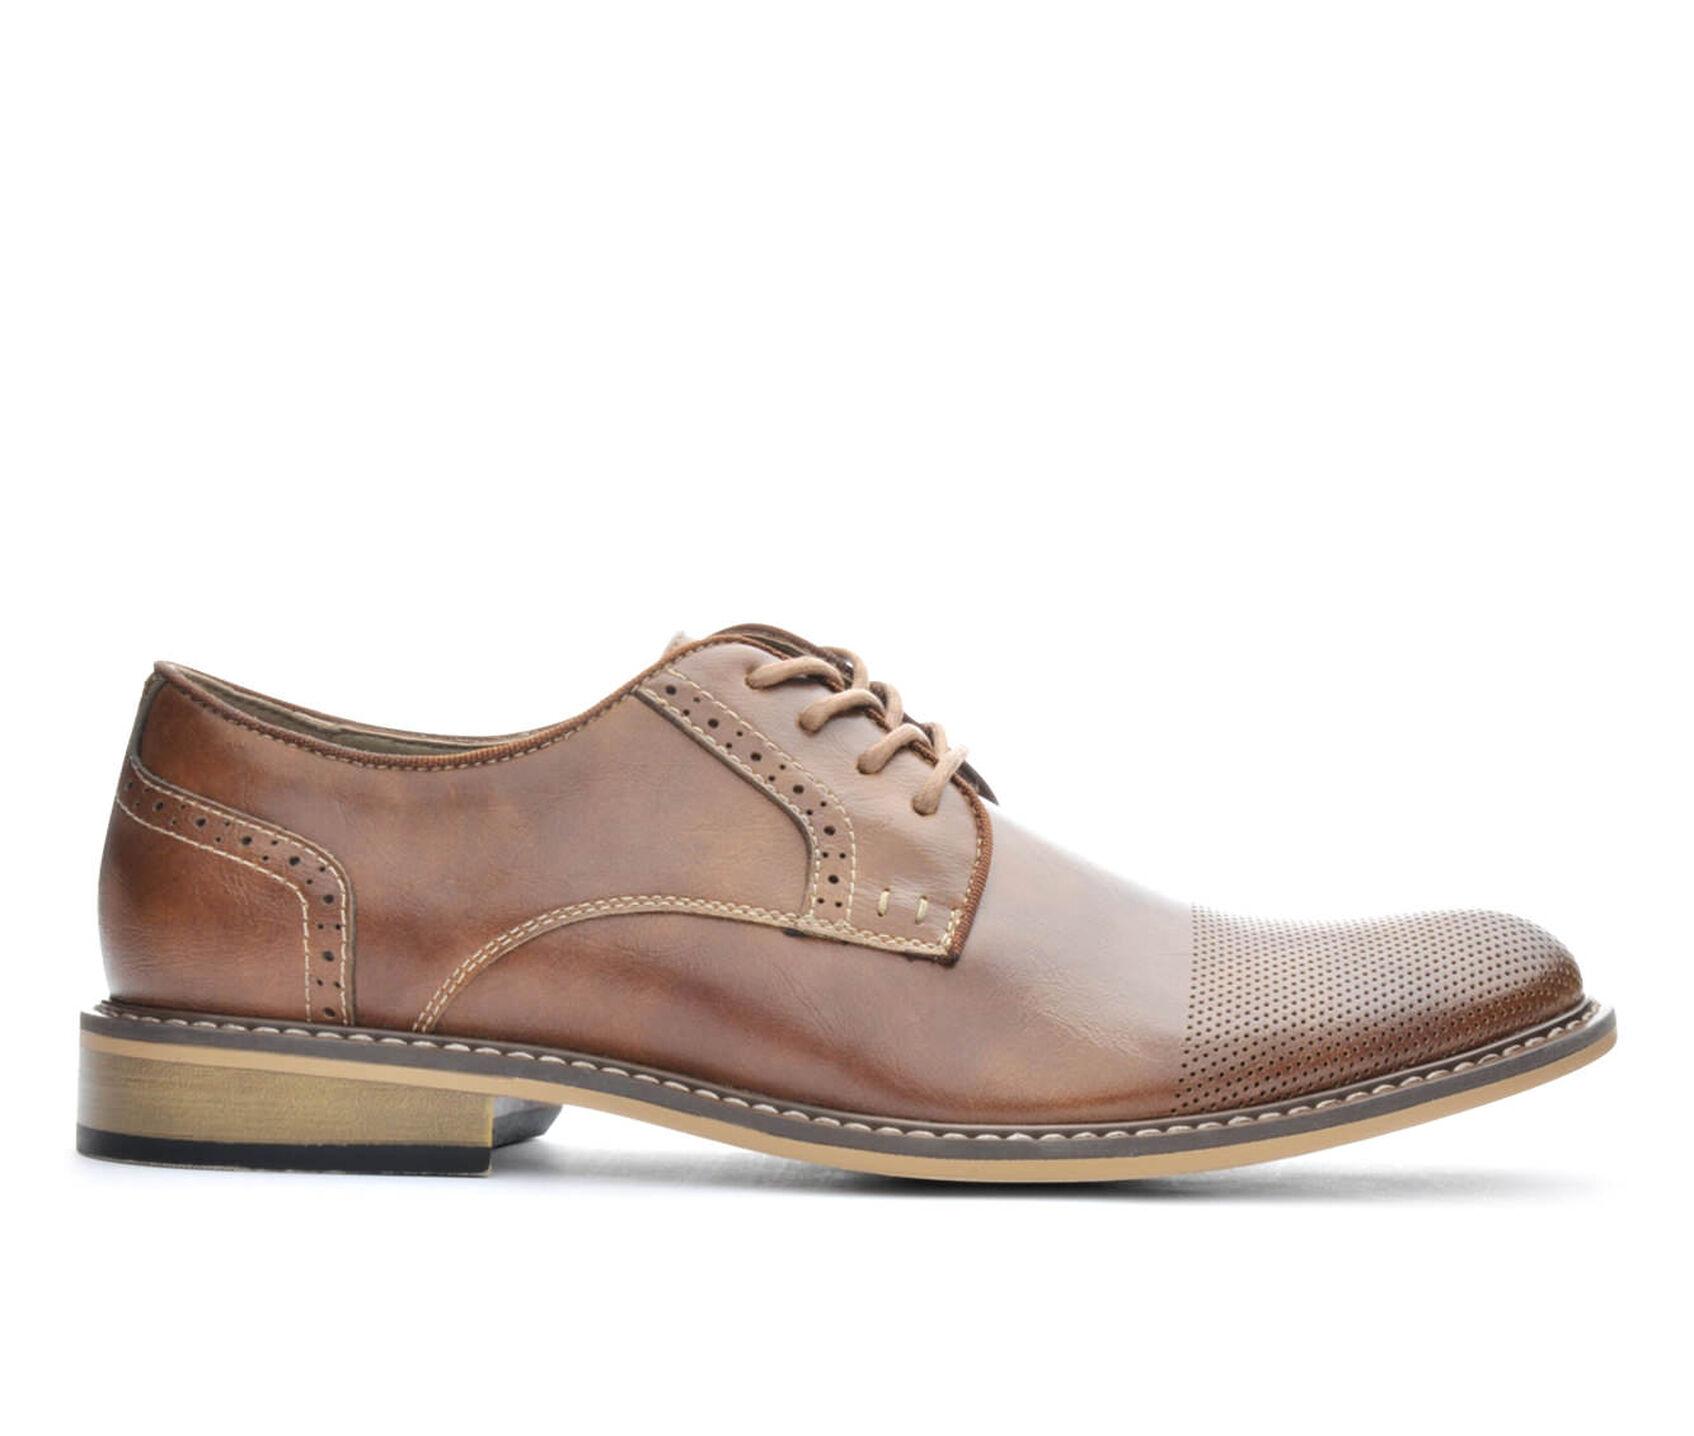 Khaki Formal Shoes